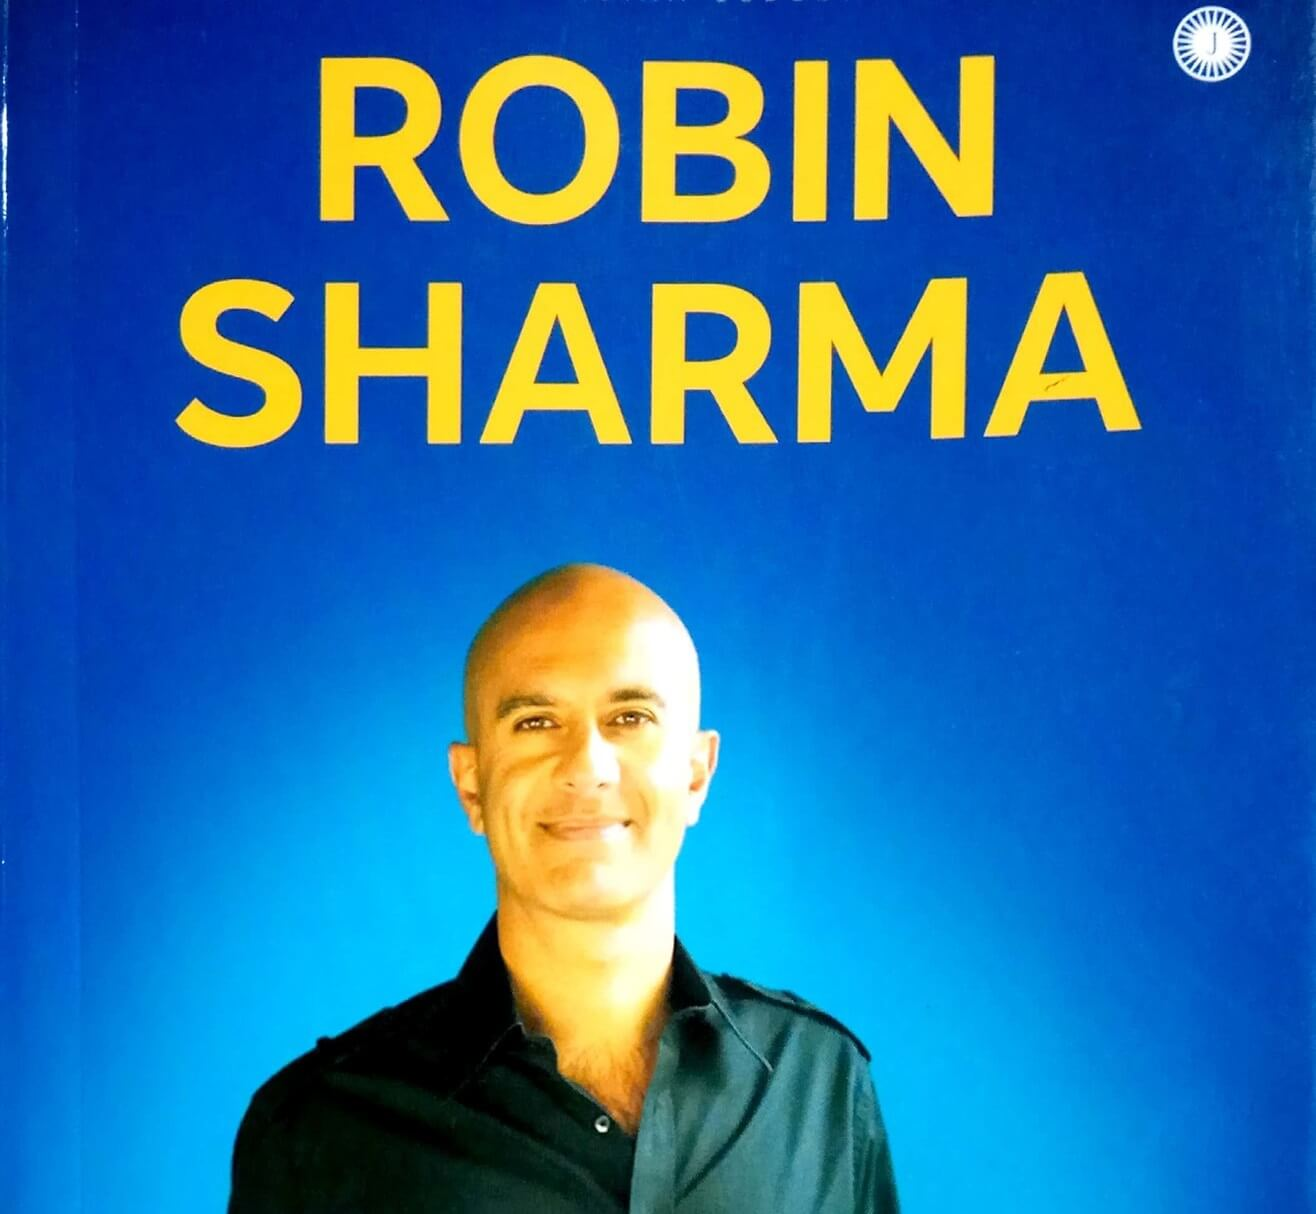 Robin Sharma Motivational Speakers